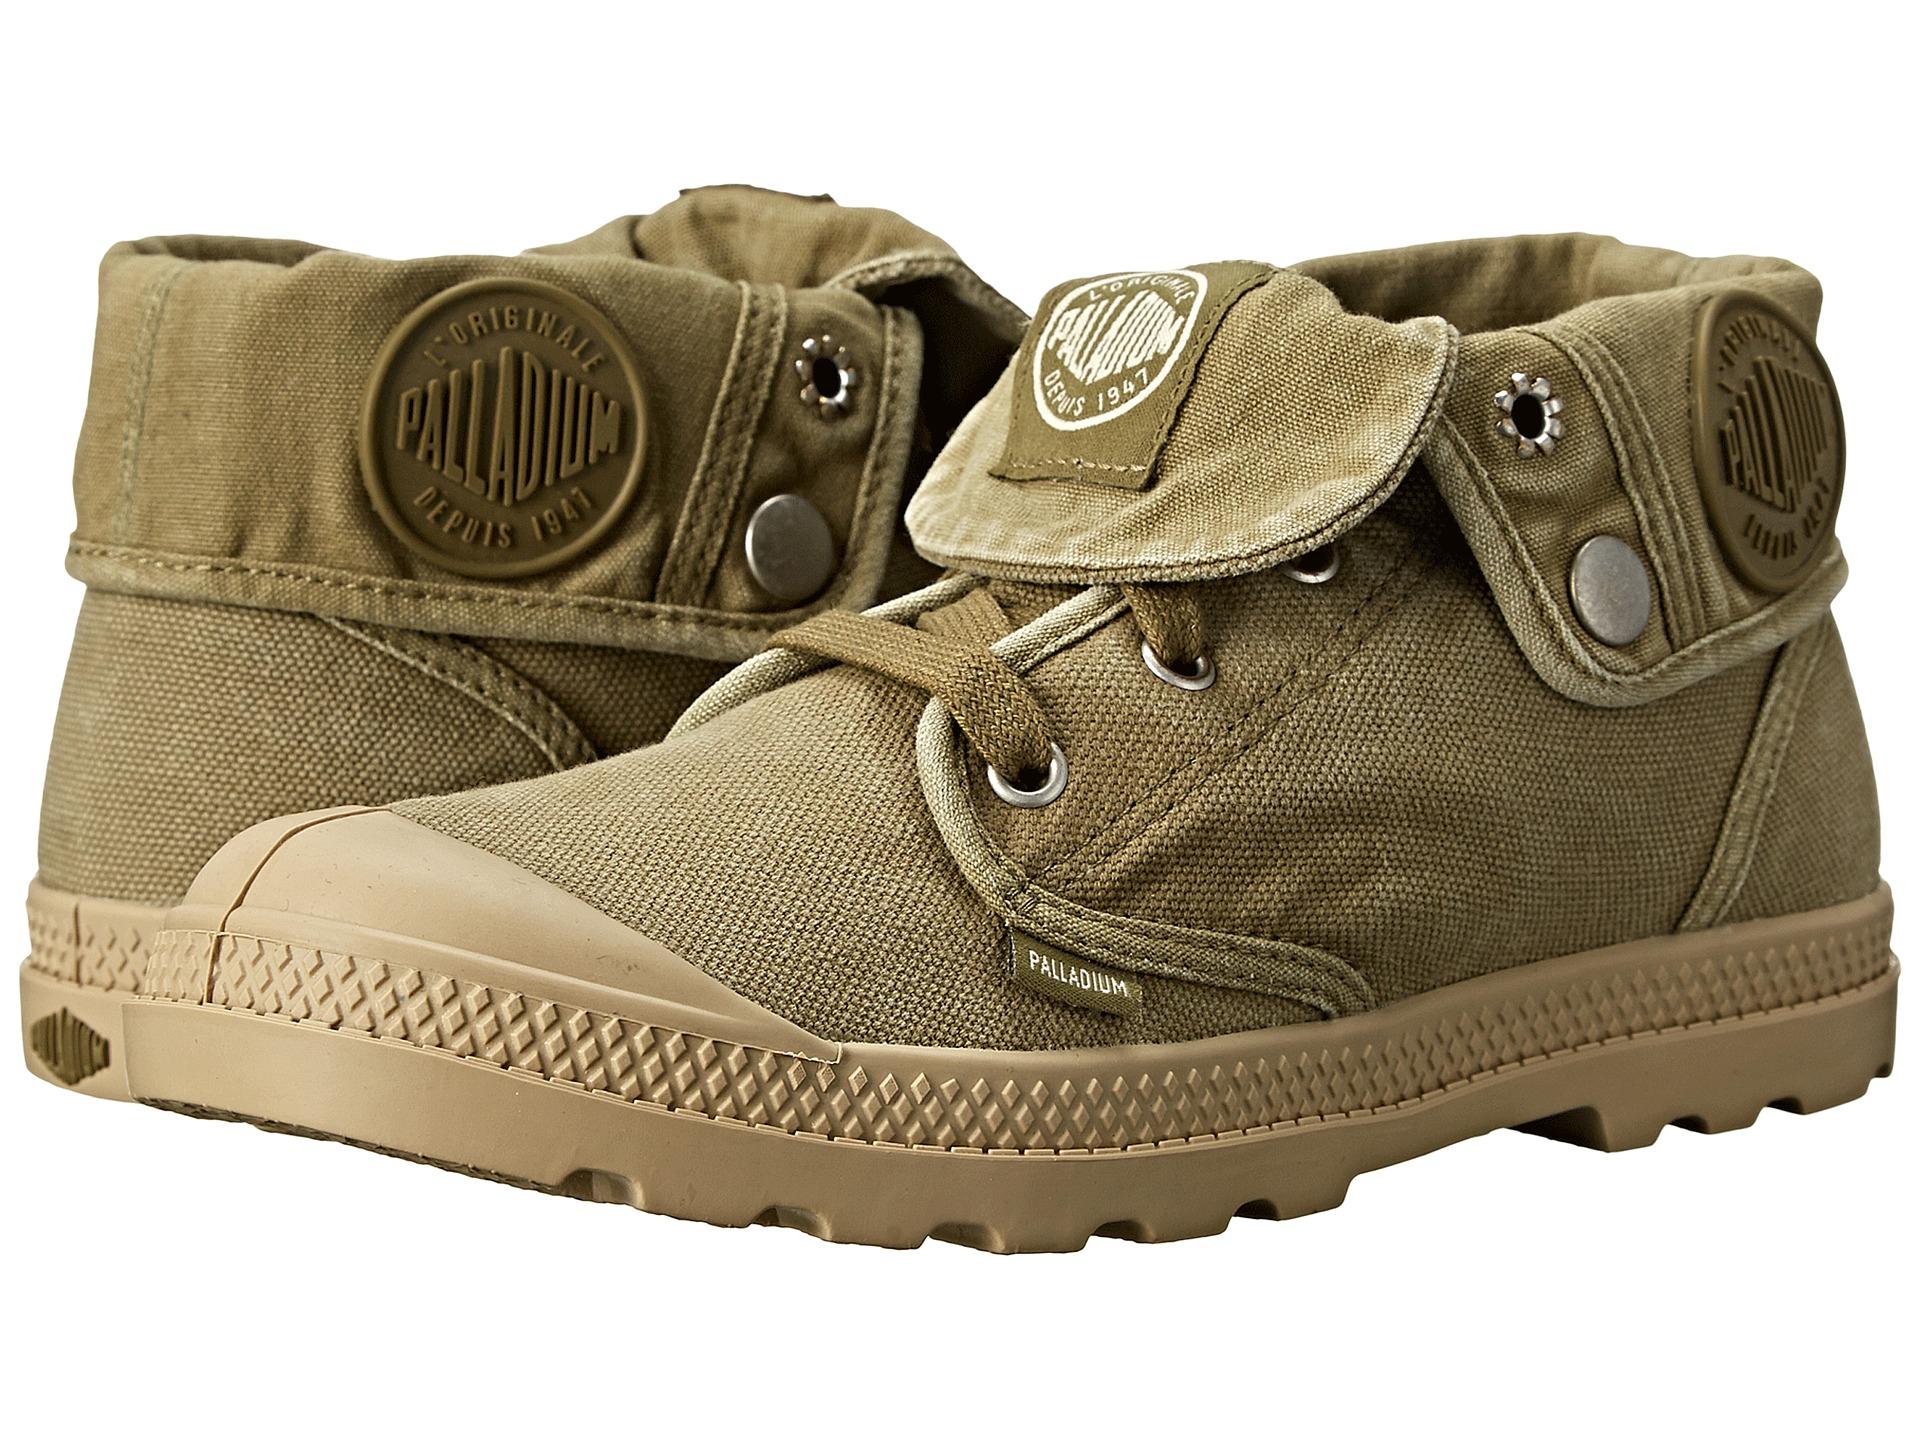 Baggy Low Lp, Womens Boots Palladium